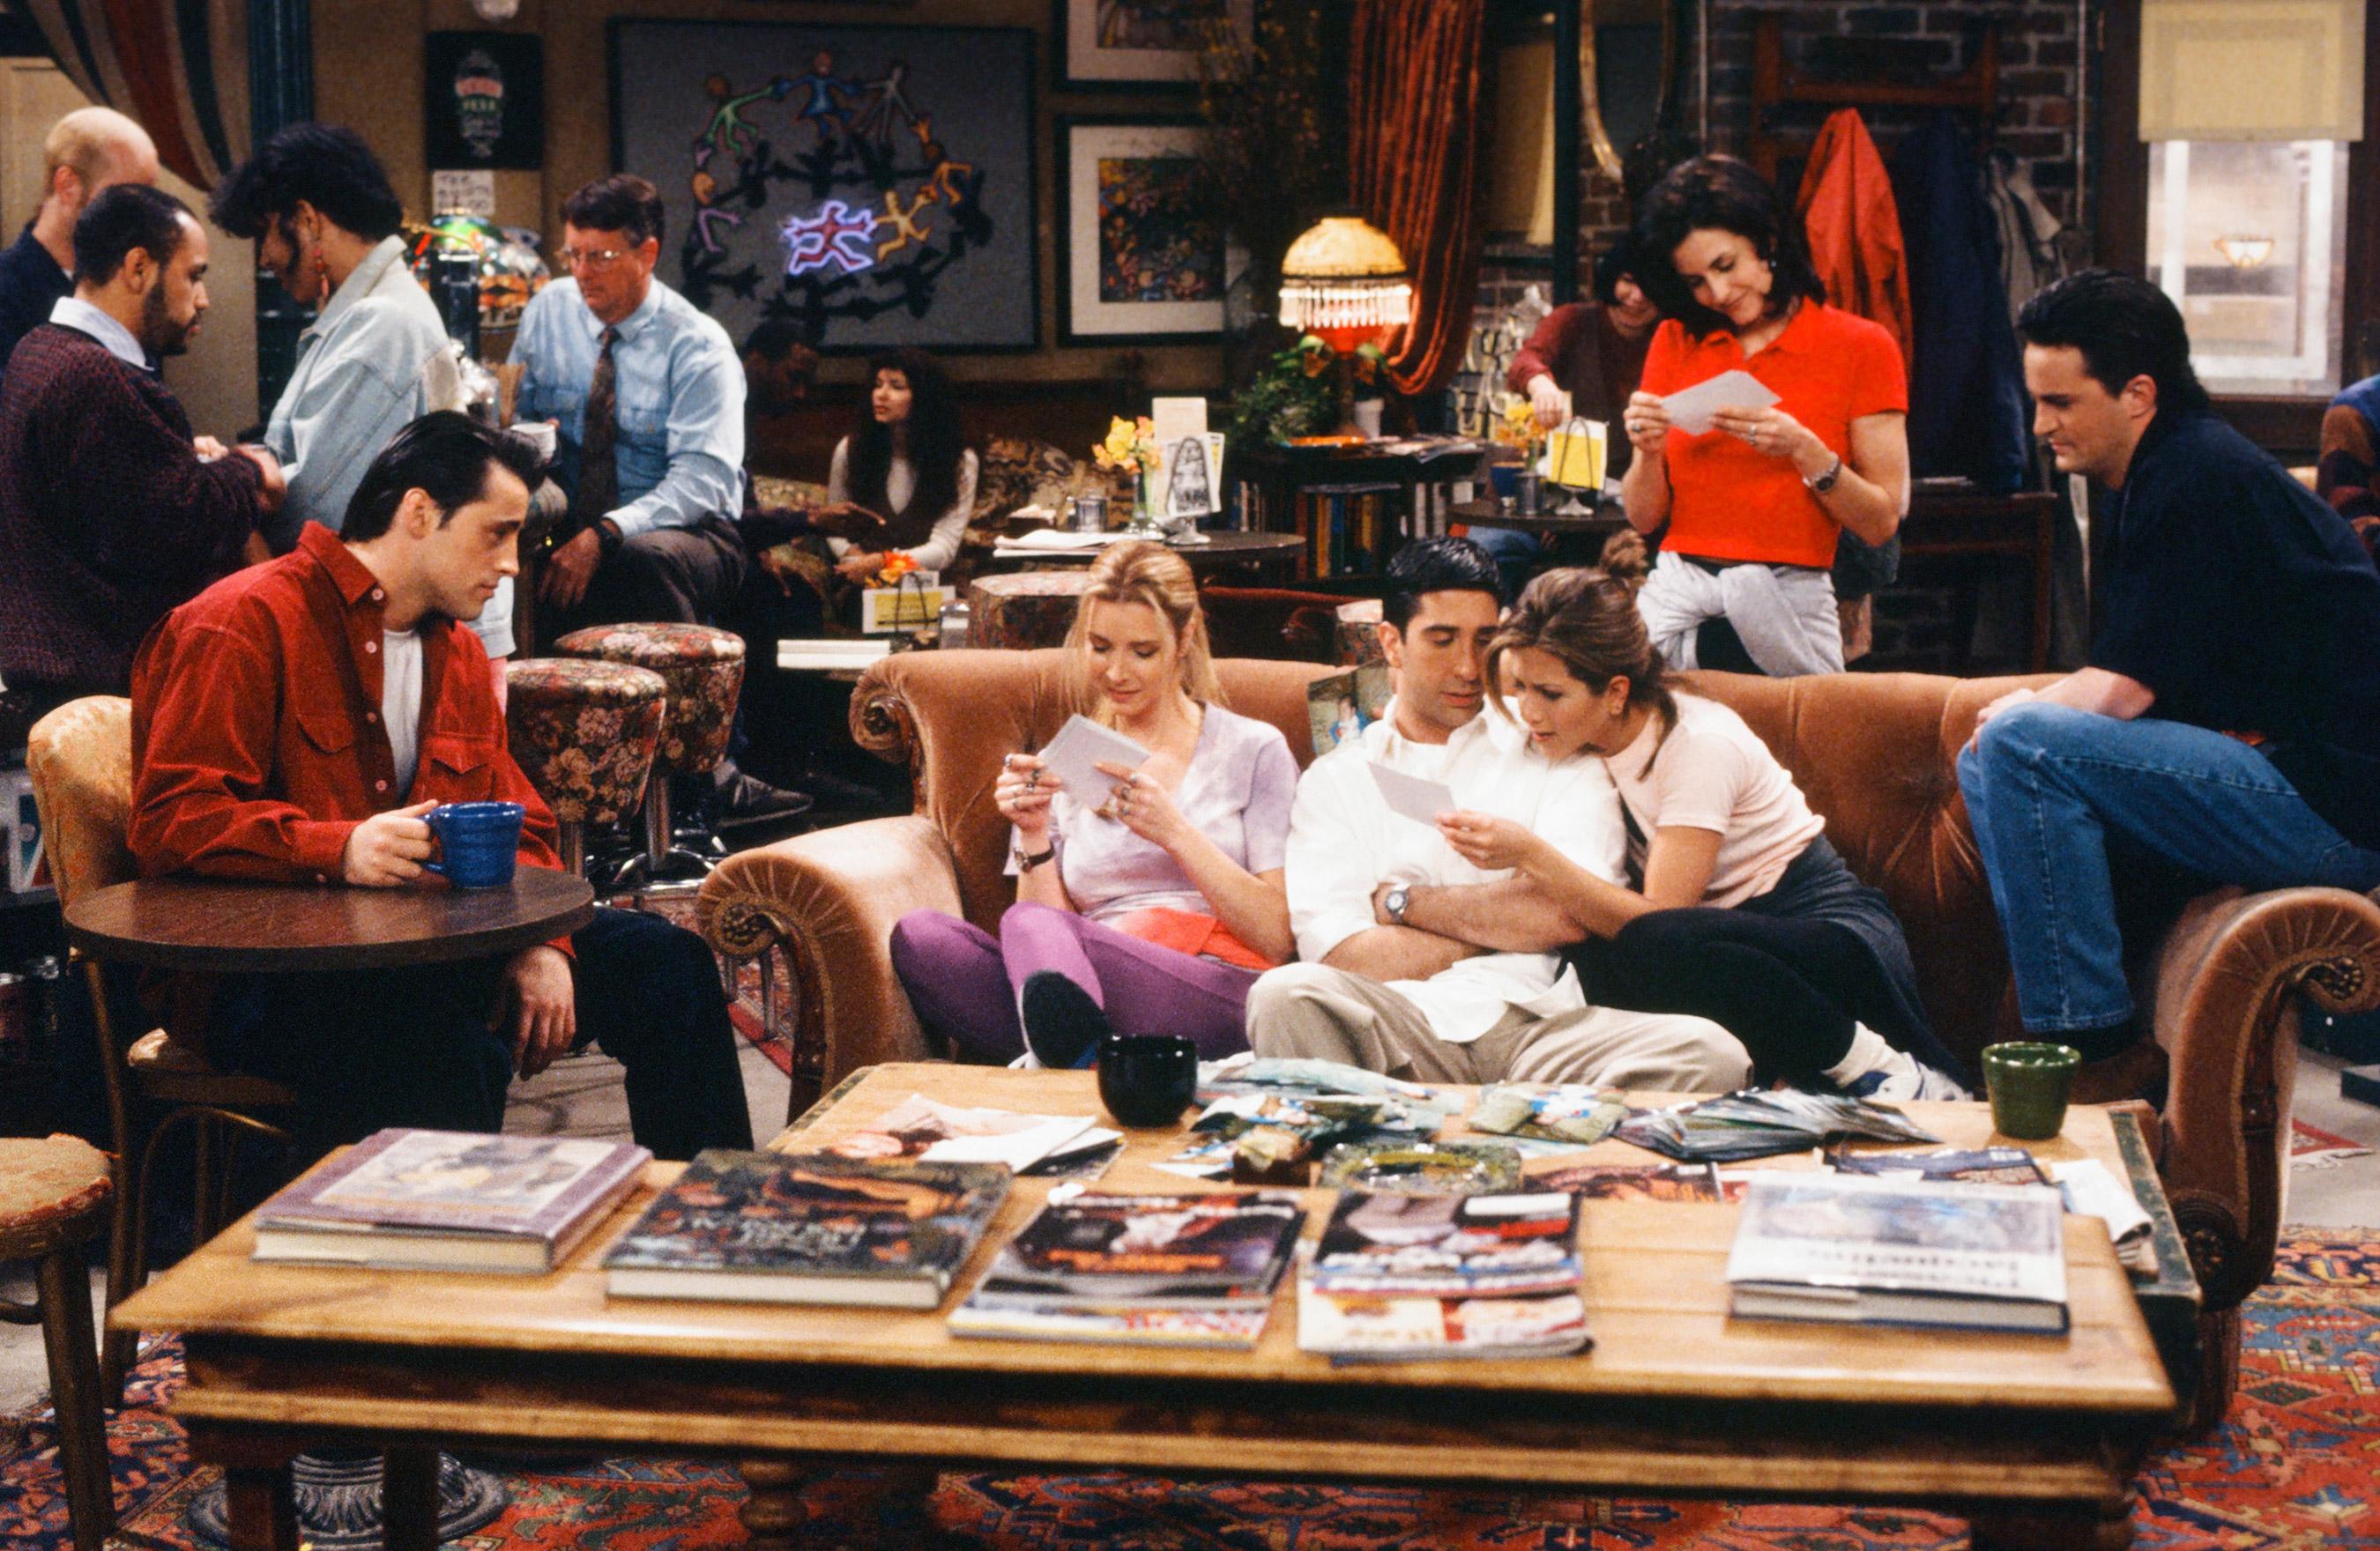 New Poll Says 60% of Friends Fans Surveyed Believe Ross and Rachel Were on a Break